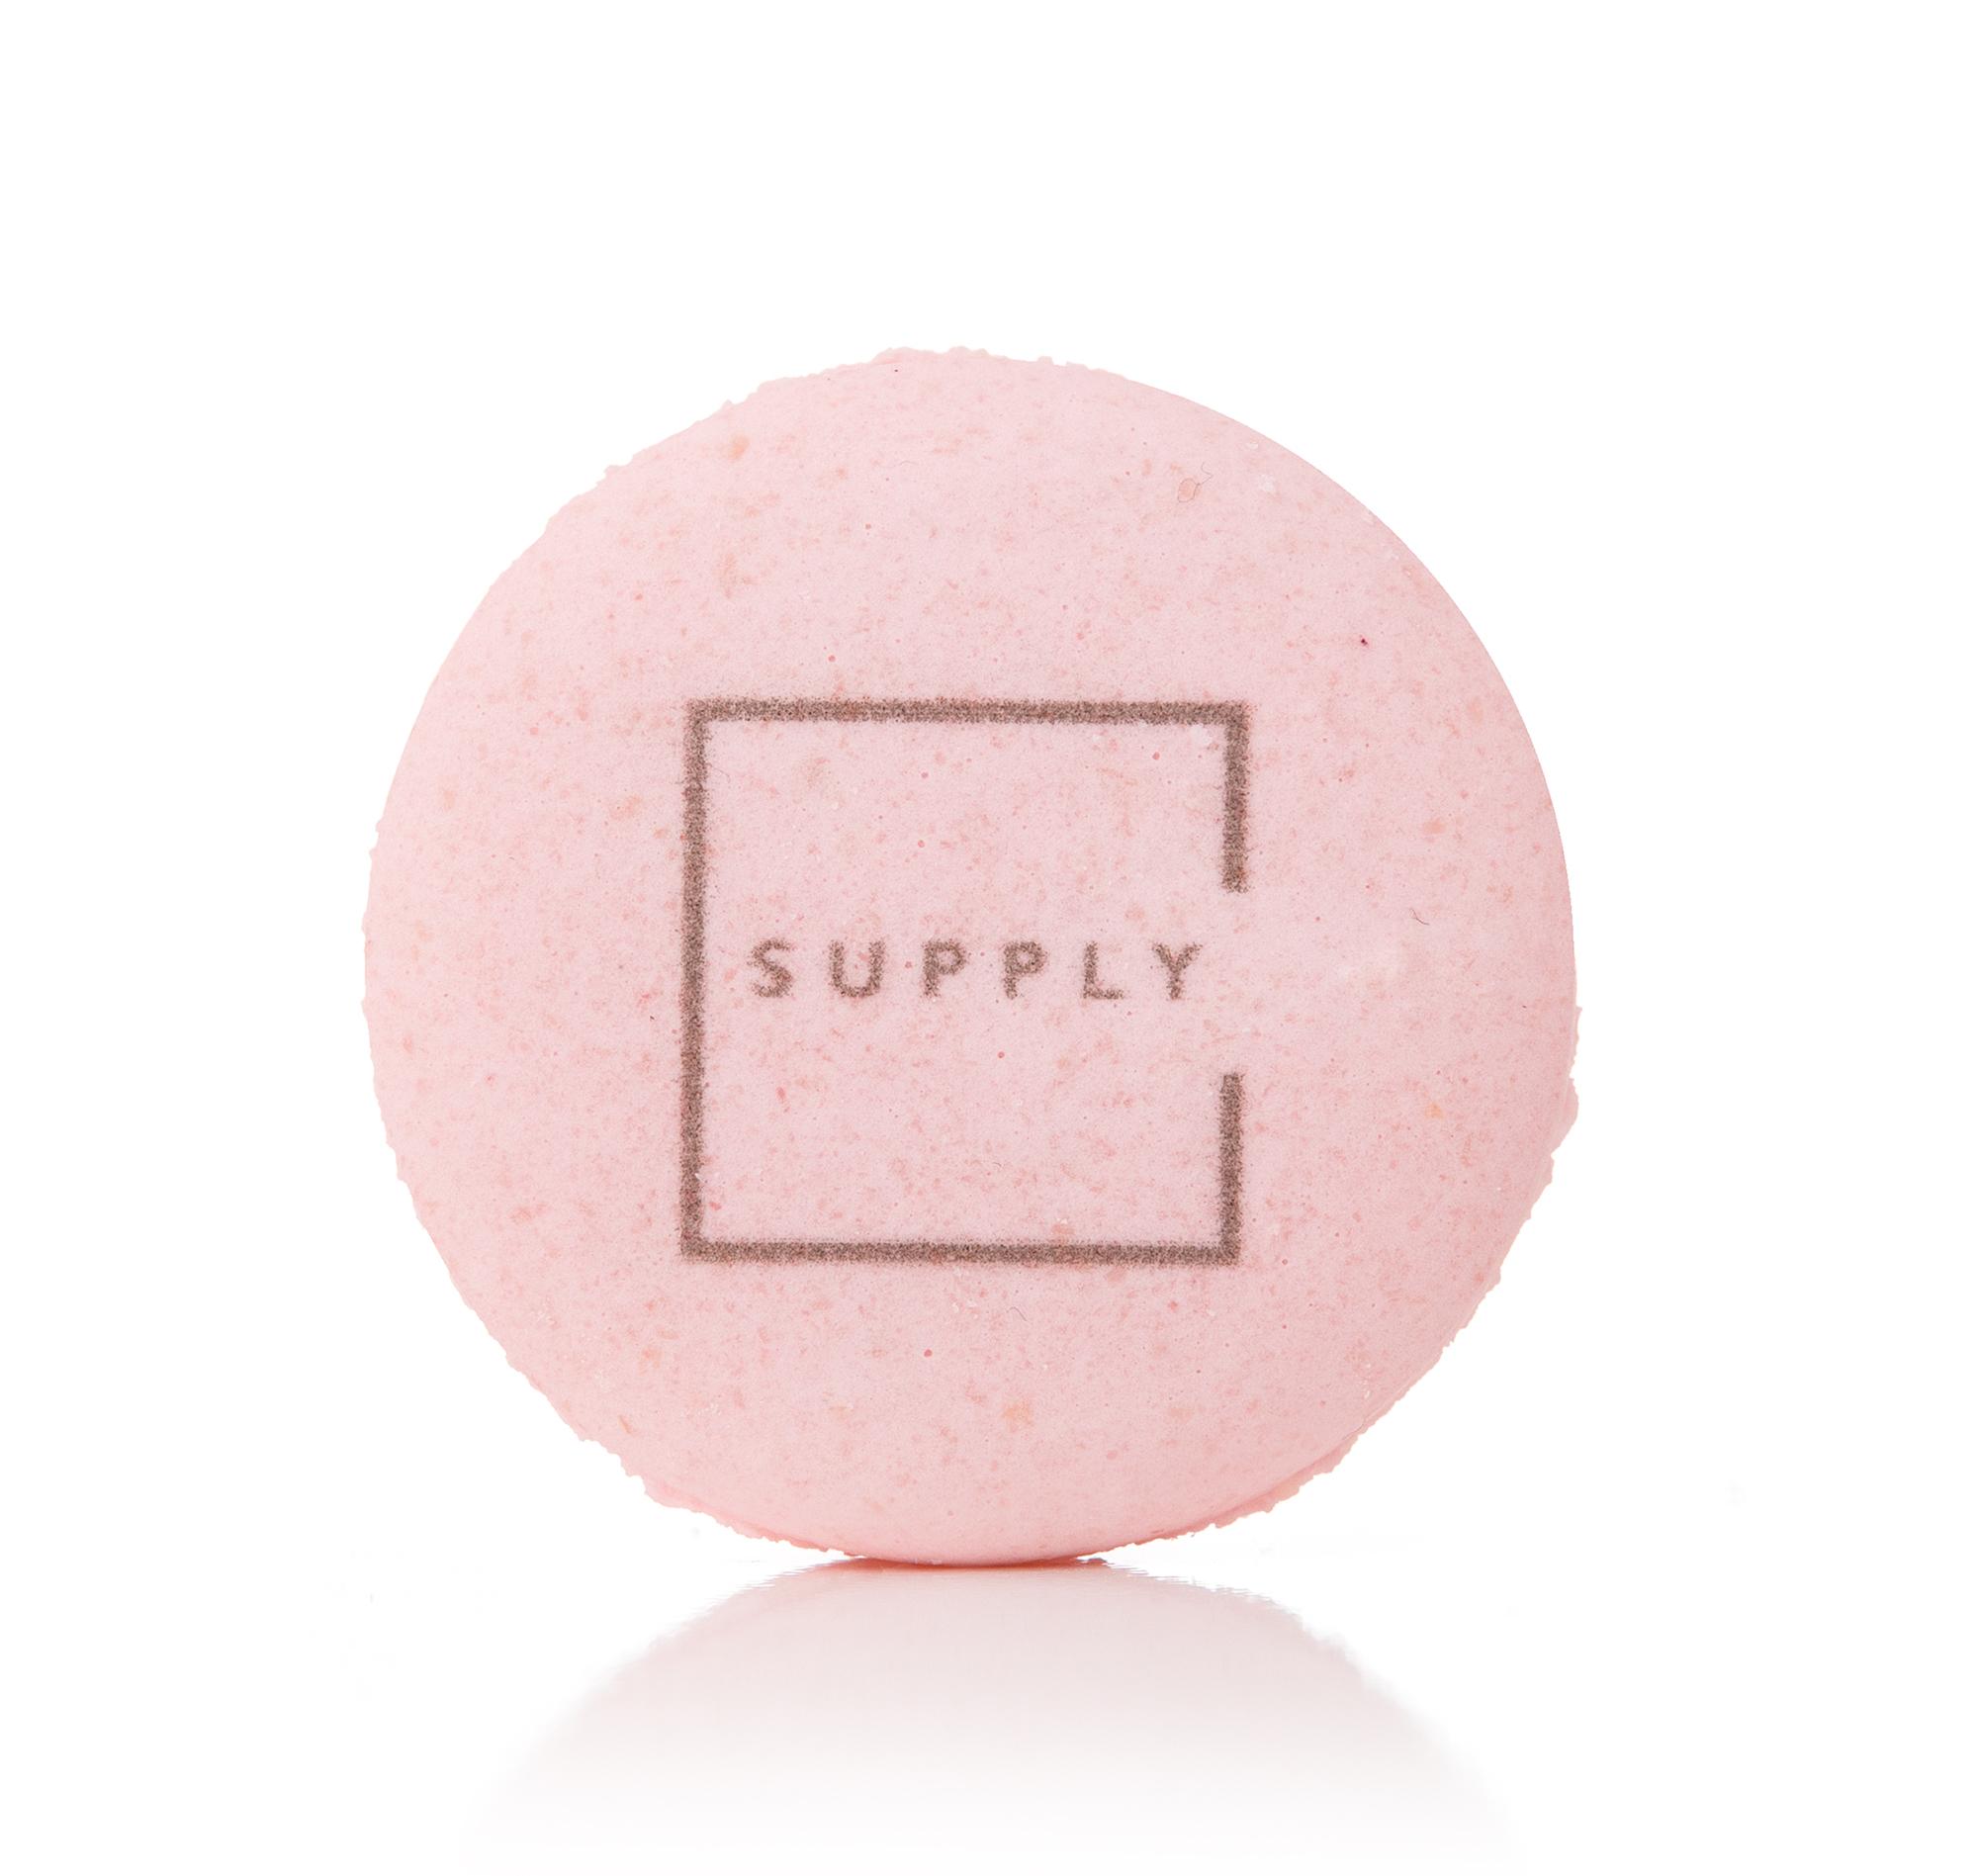 Supply Macaron.jpg